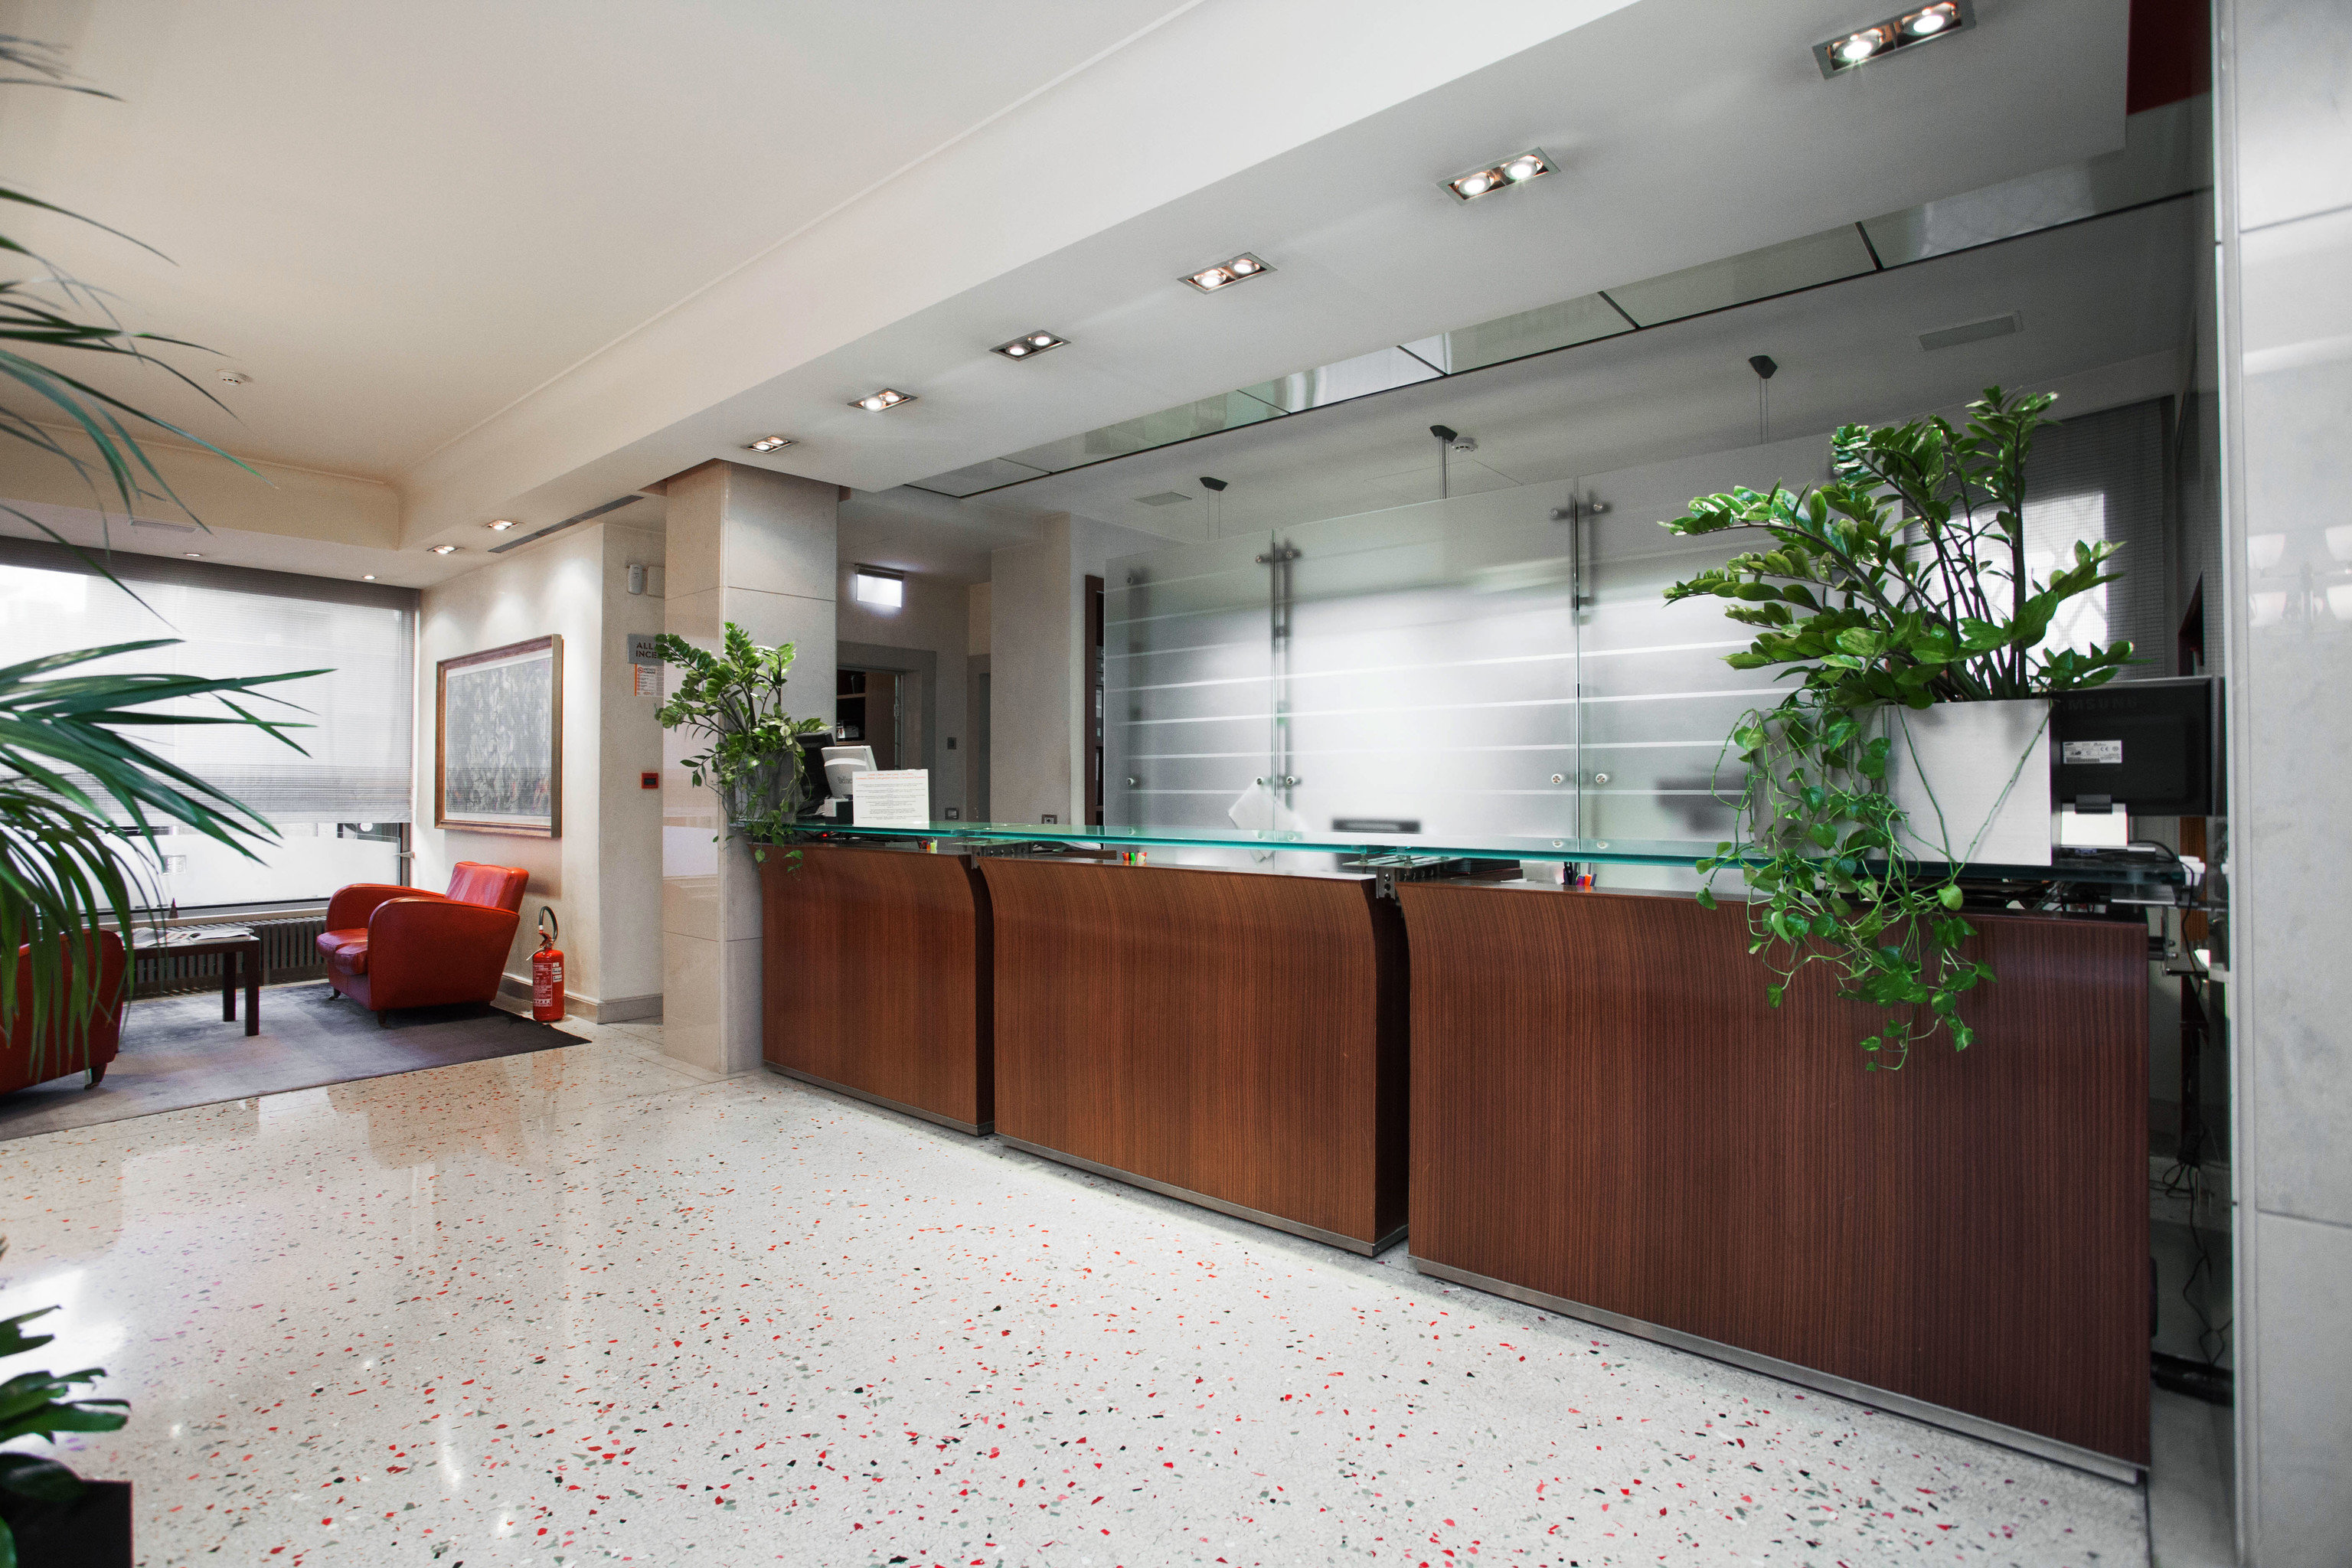 property Lobby building condominium office receptionist headquarters waiting room